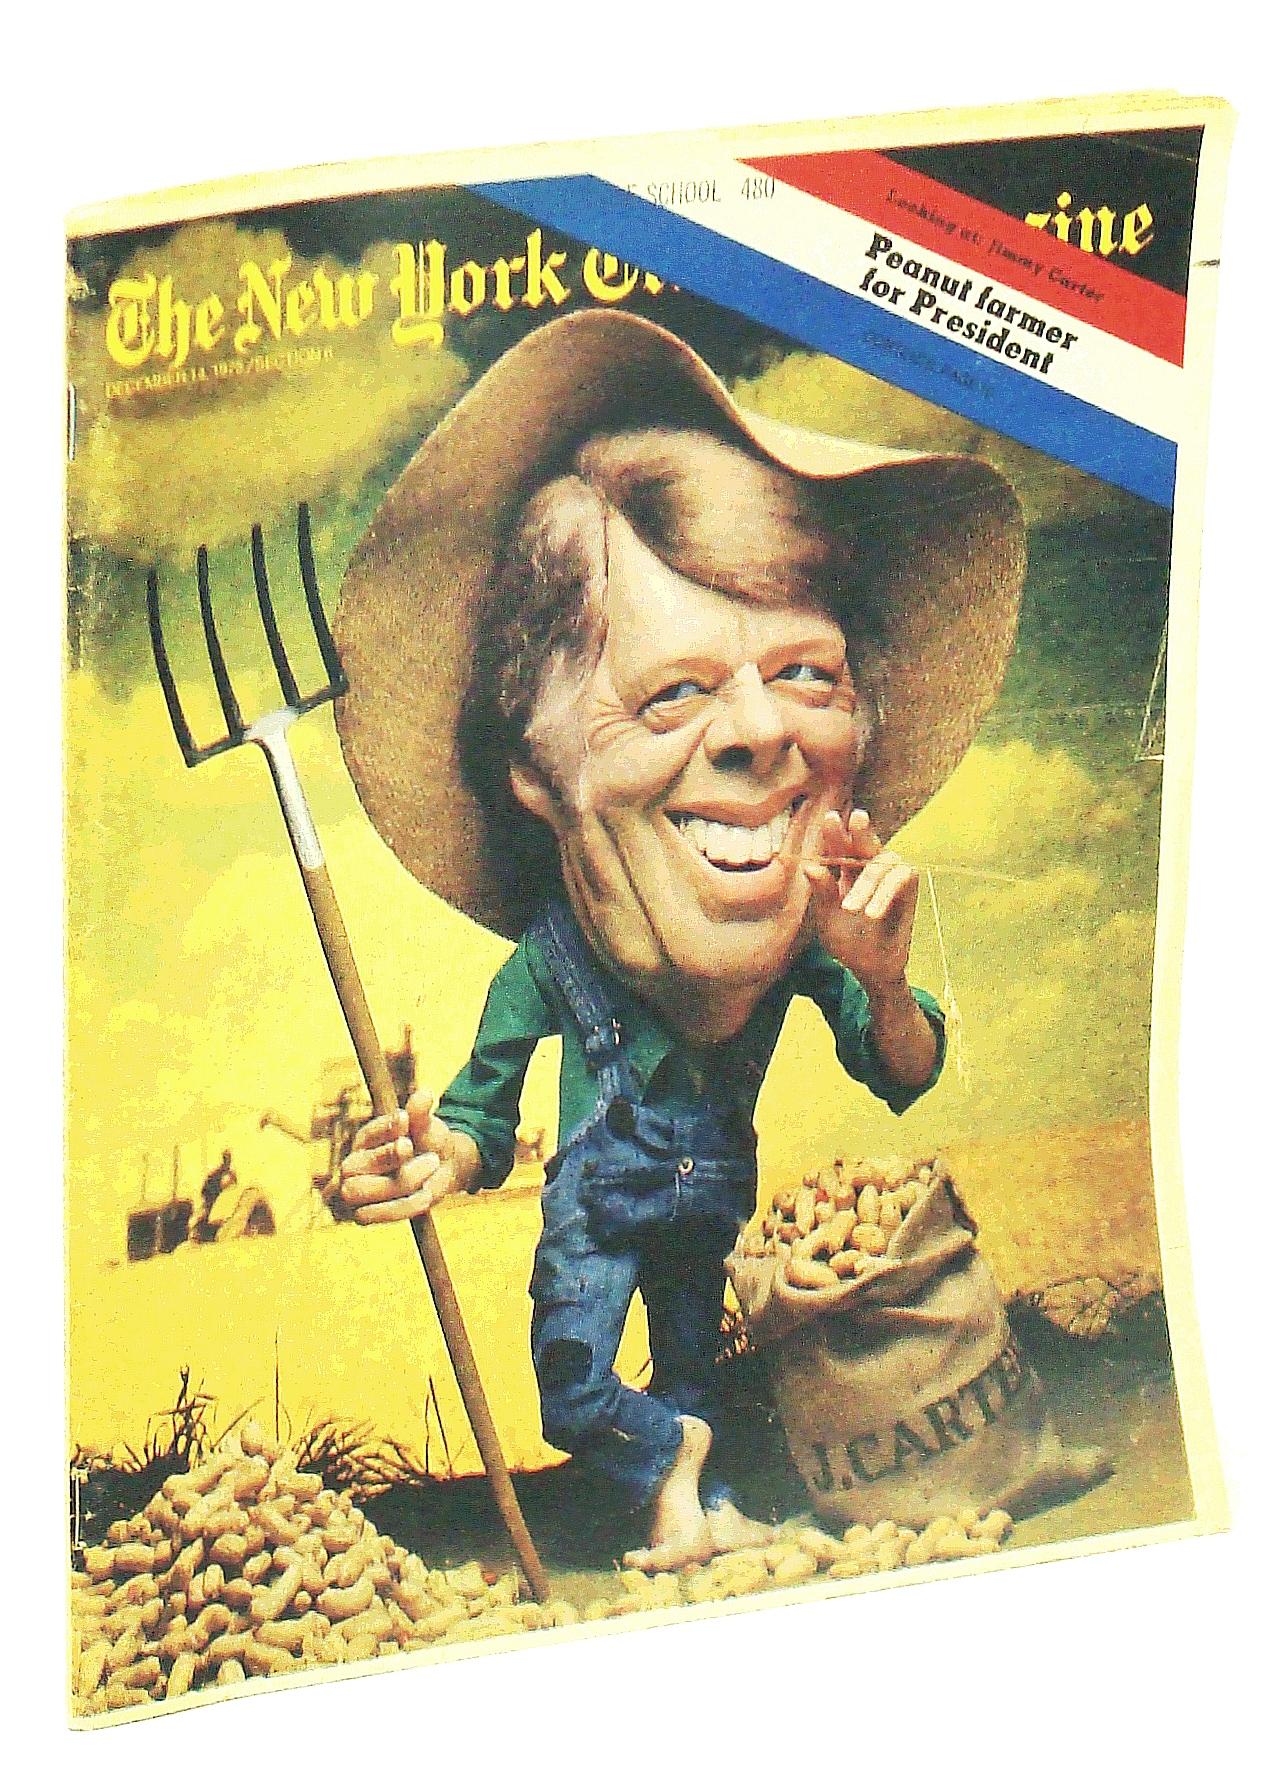 Image for The New York Times Magazine, December [Dec.] 14, 1975: Peanut Farmer for President - Jimmy Carter / O.J. Simpson of the Buffalo Bills